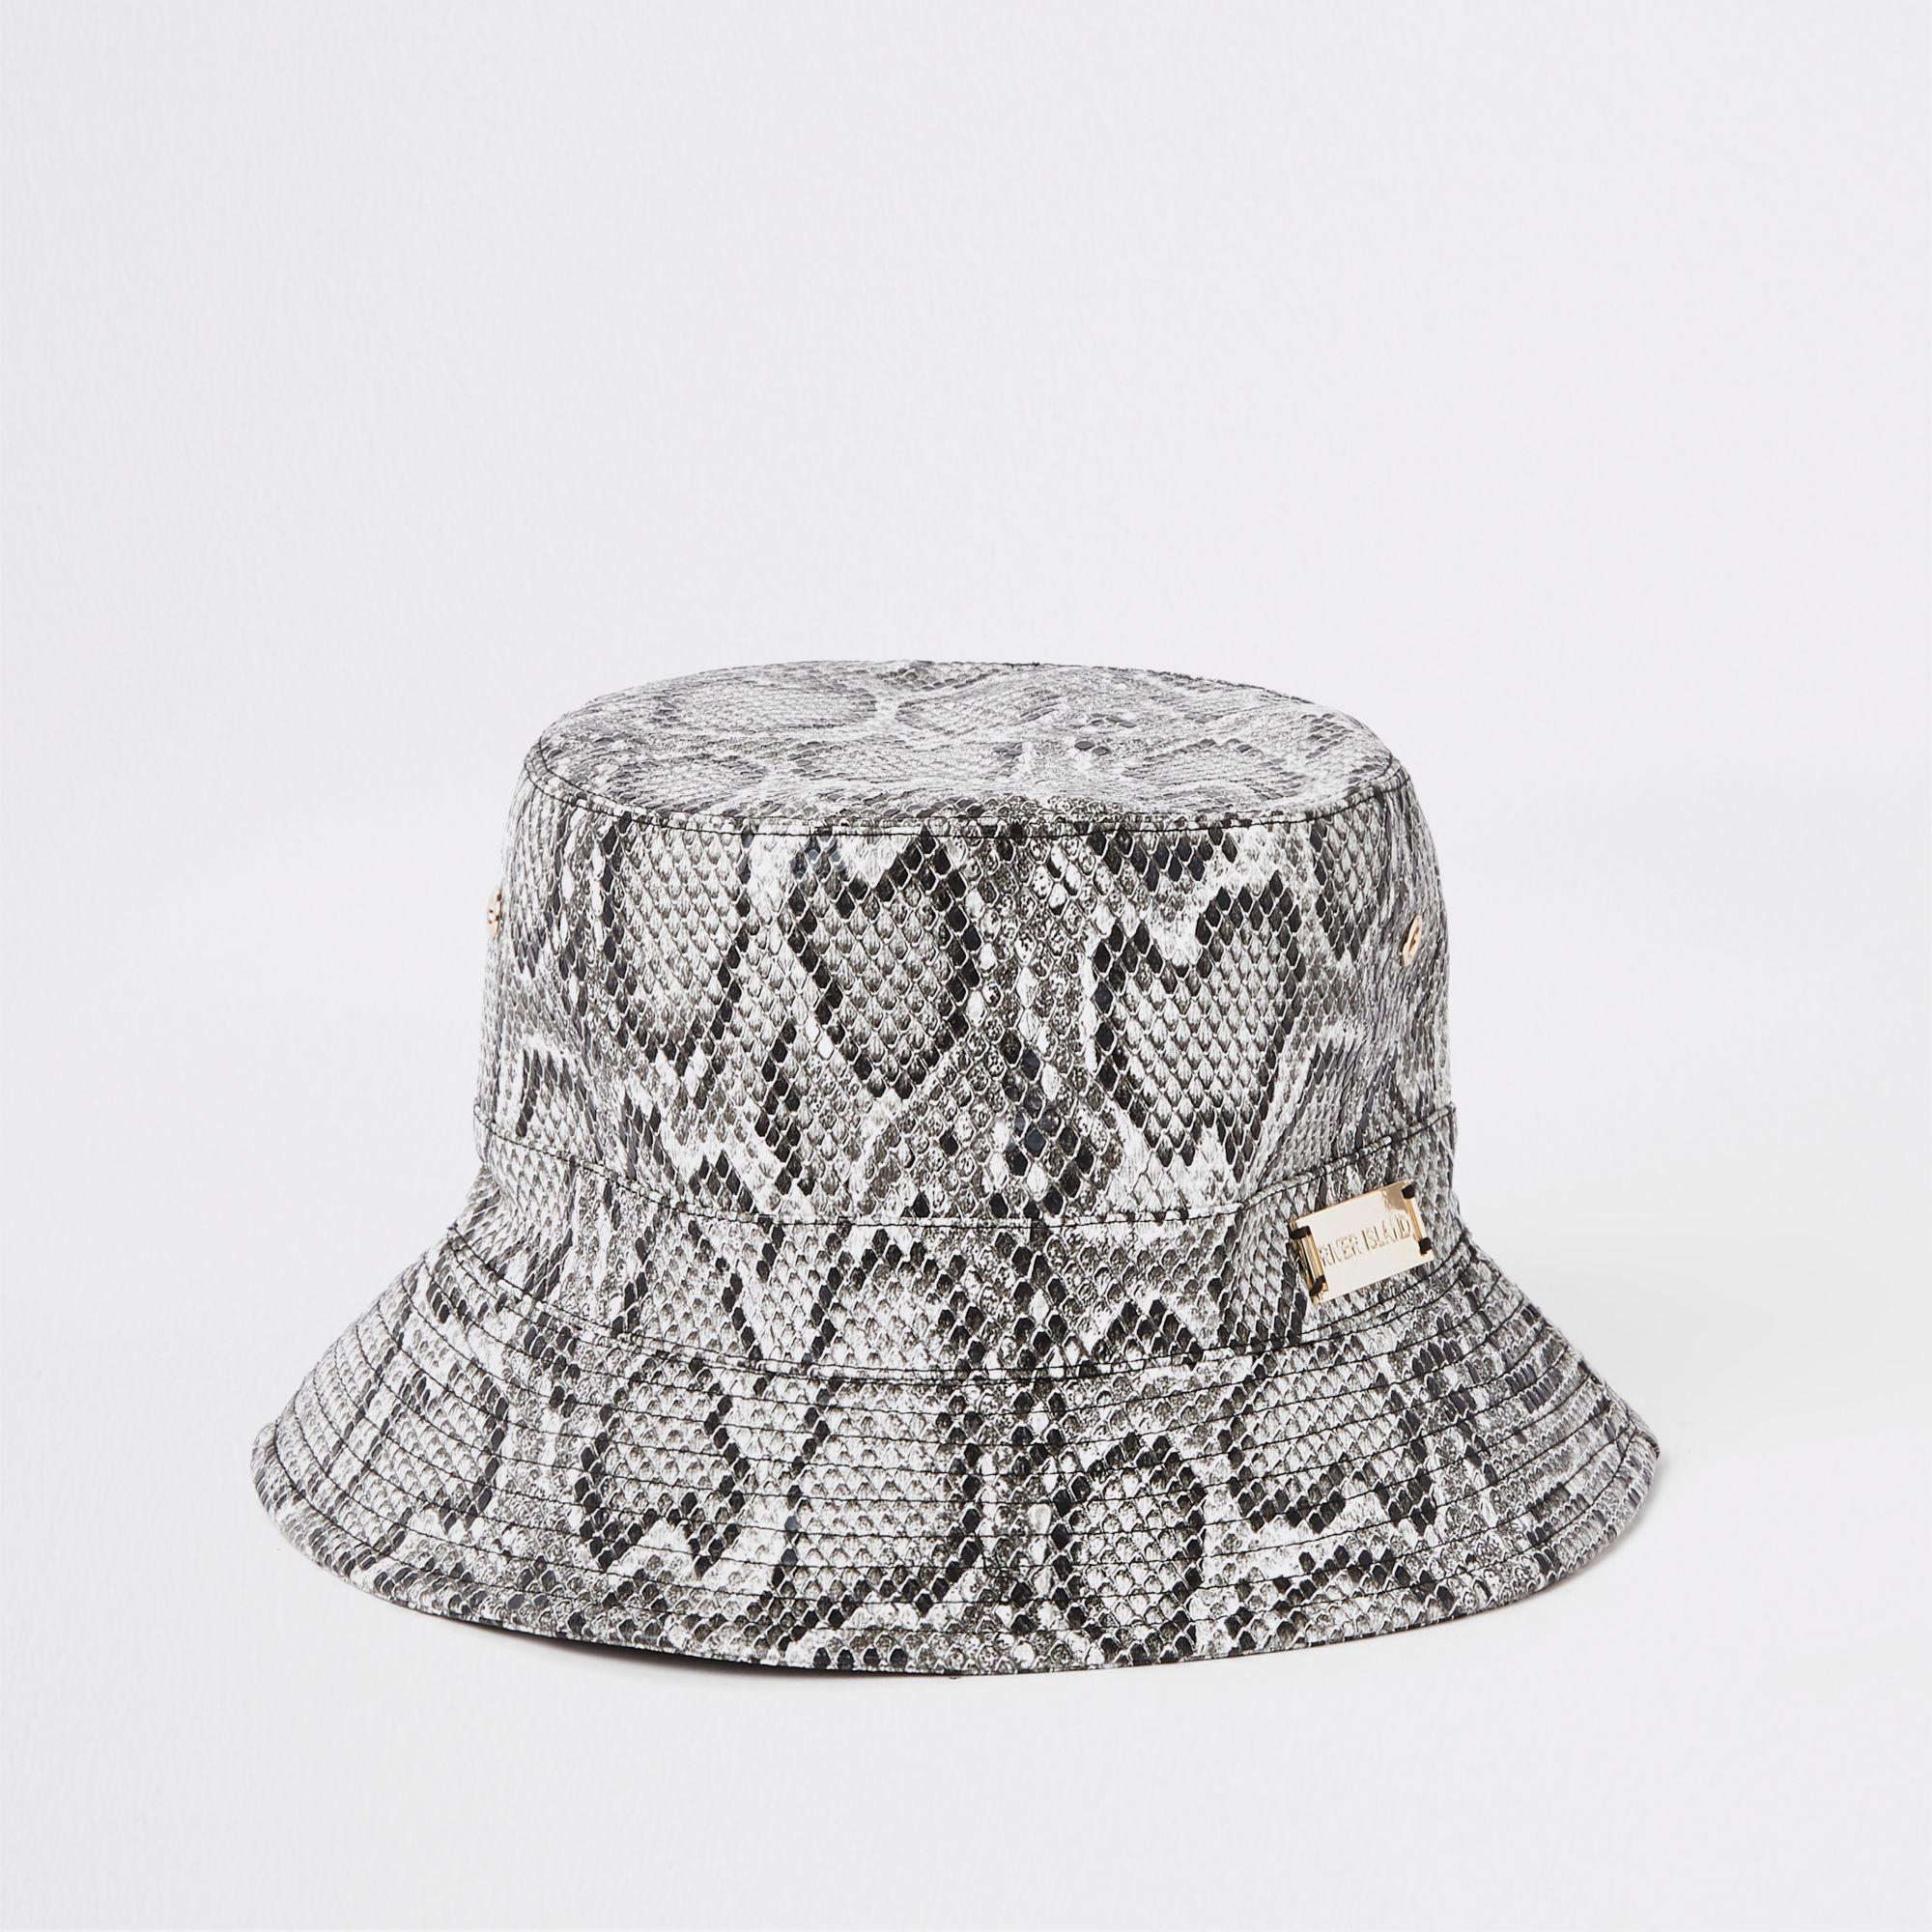 778c12a36 Women's Gray Snake Print Bucket Hat